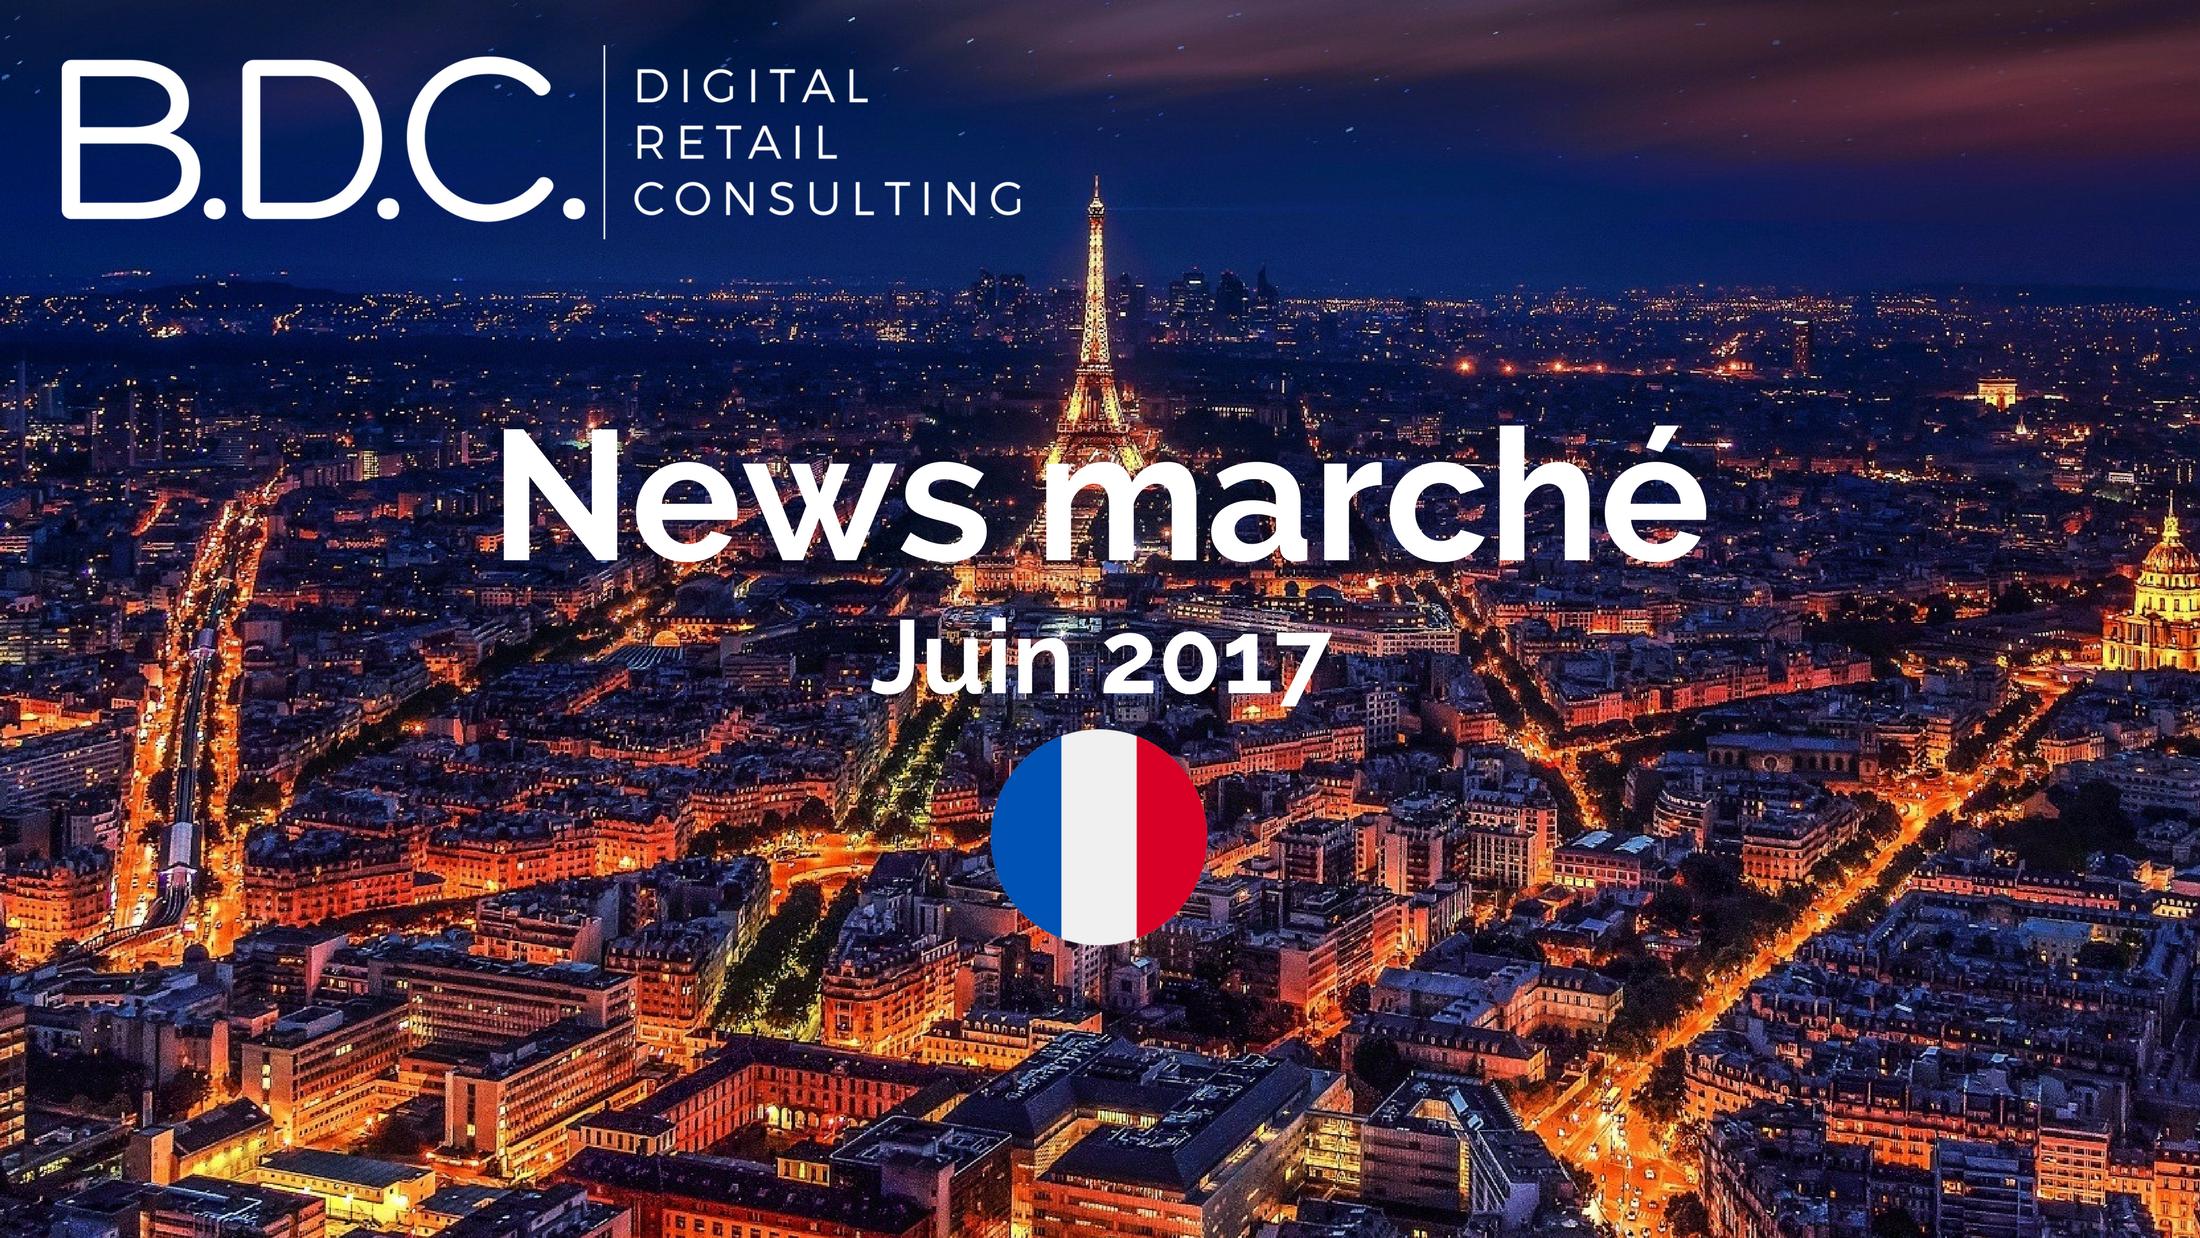 Trends News 12 - News marché- Juin 2017